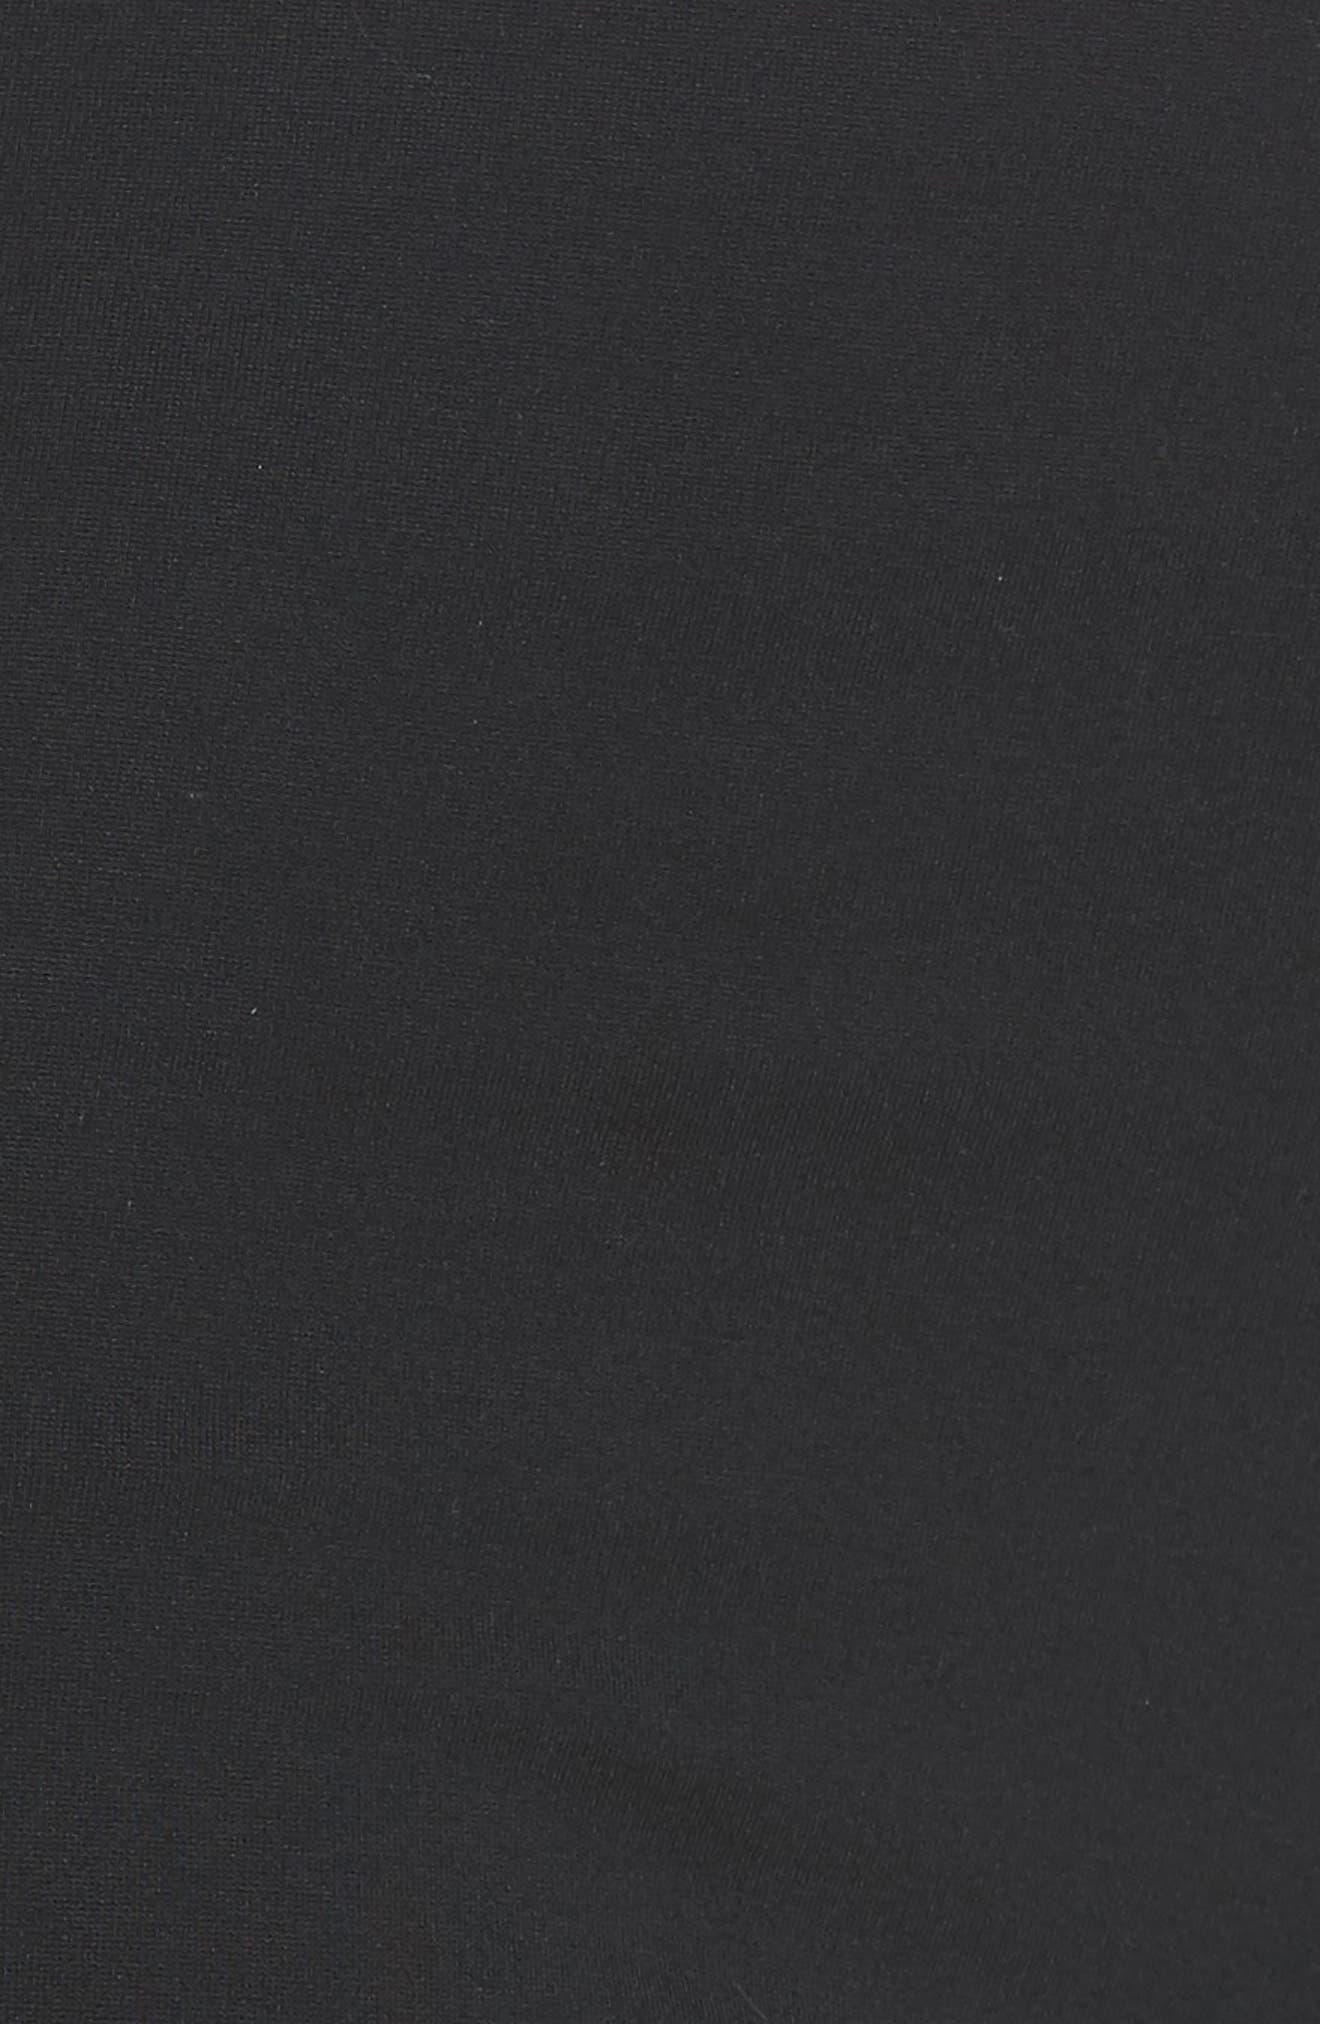 Sedona Leggings,                             Alternate thumbnail 6, color,                             Black